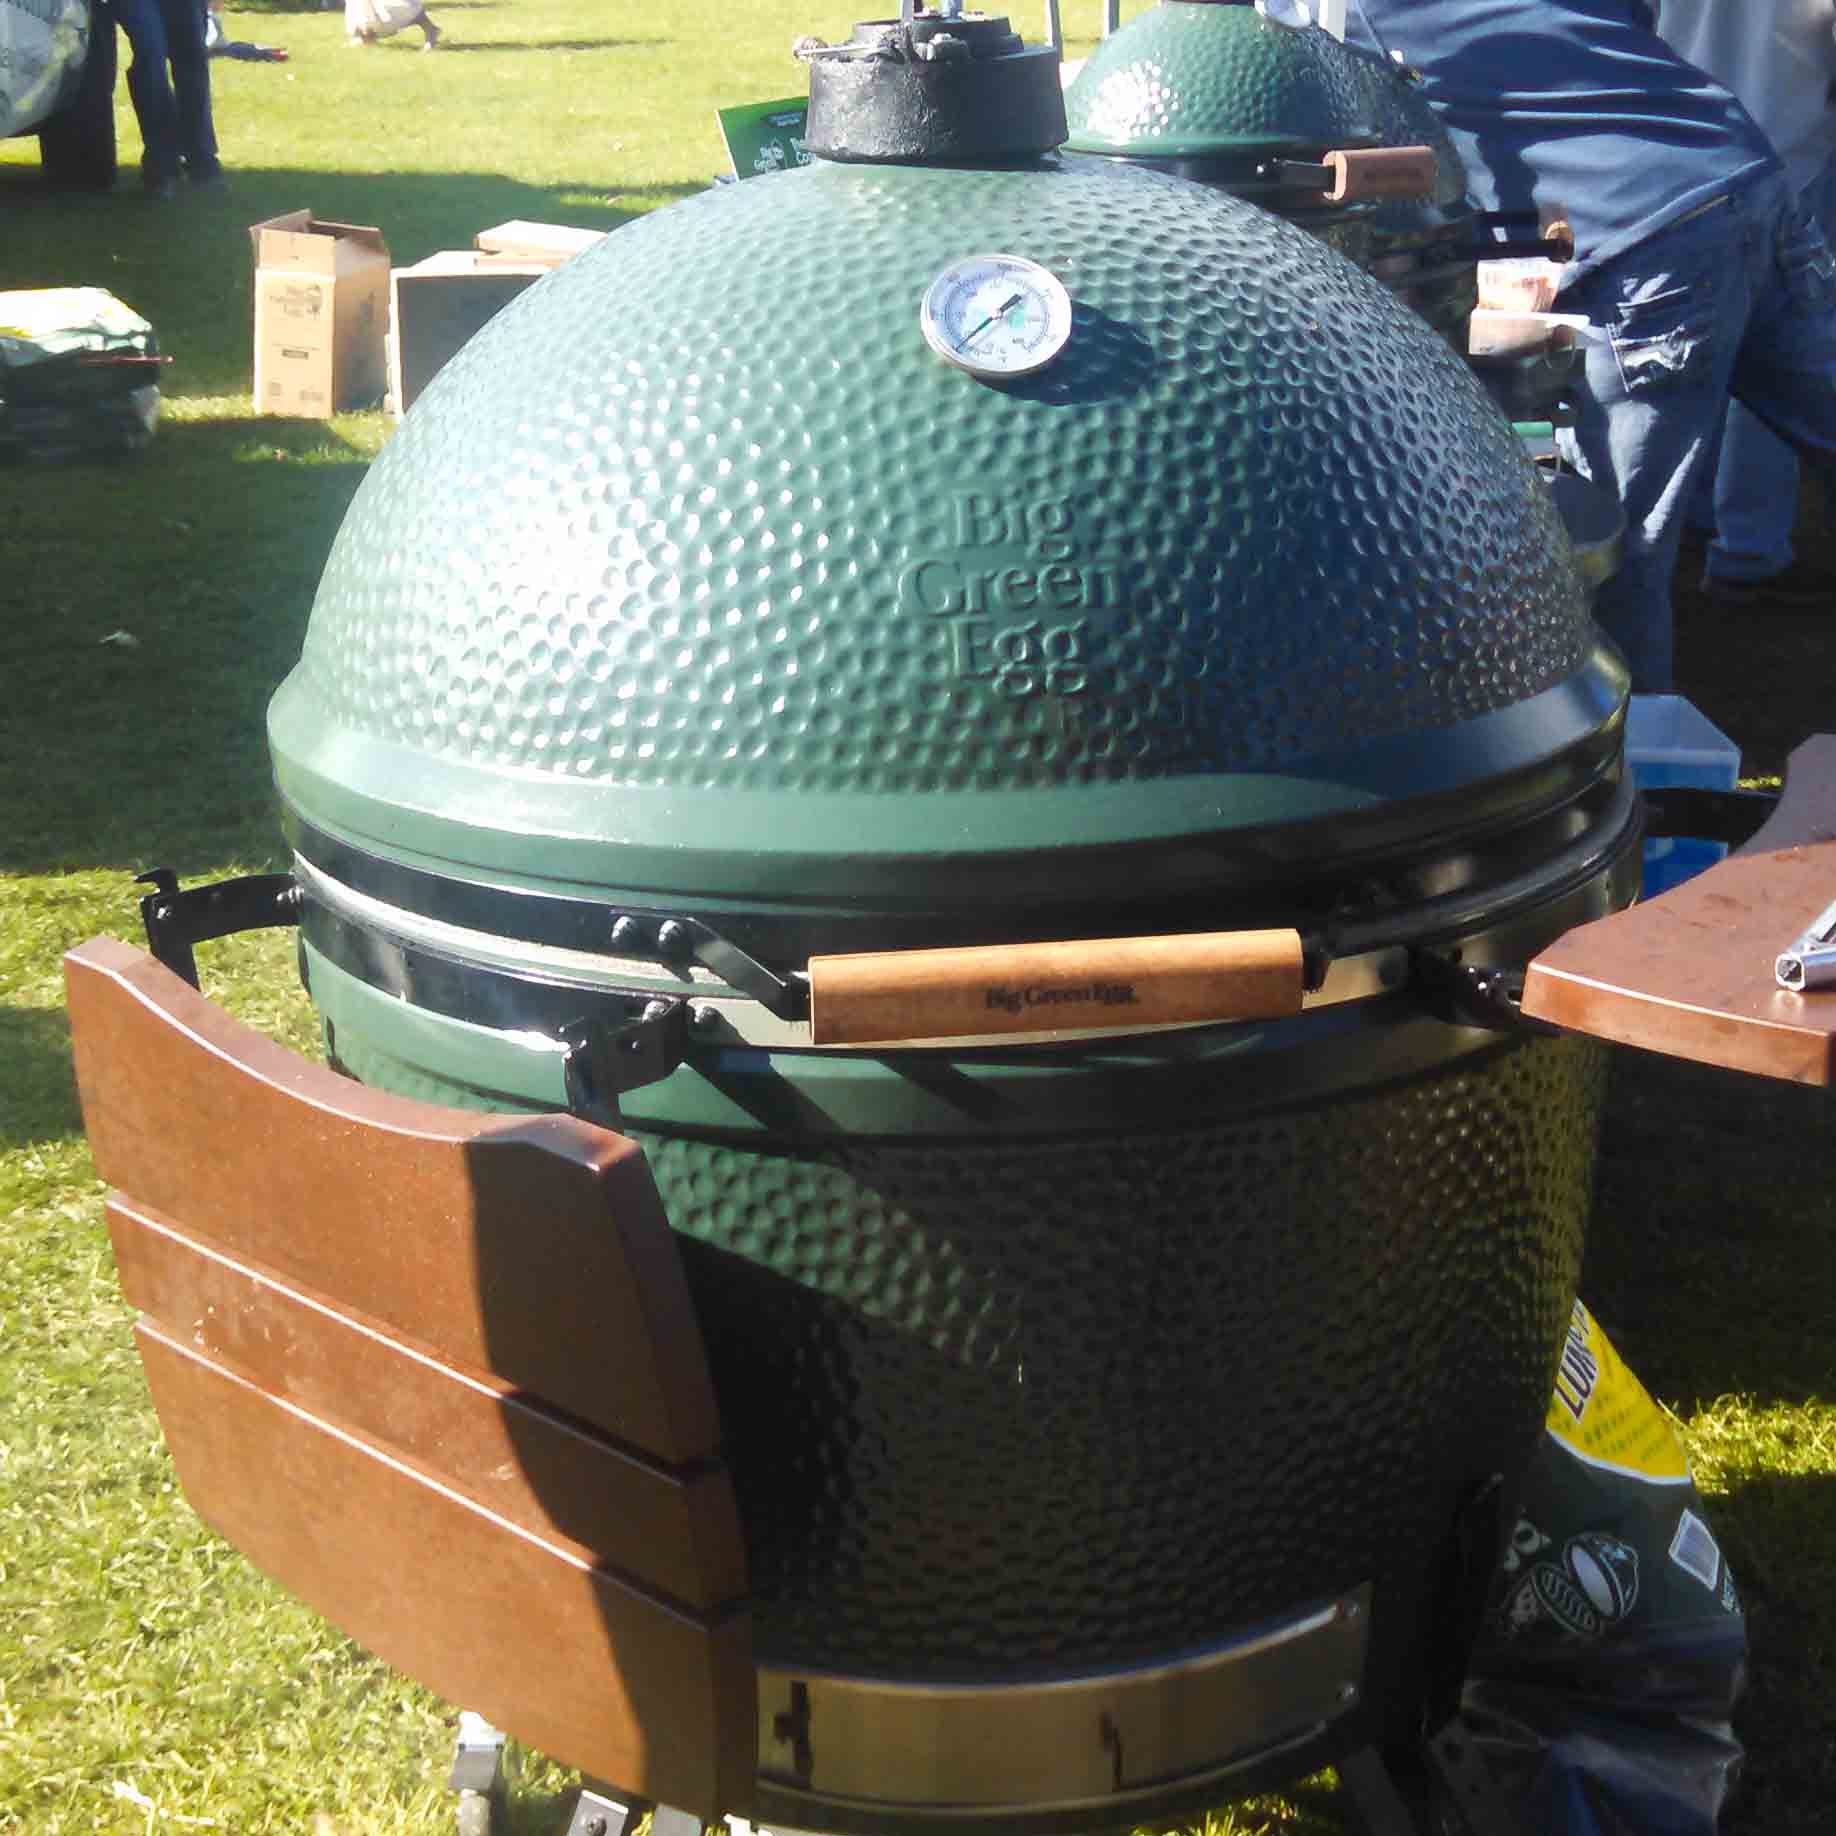 xxl big green egg food fire. Black Bedroom Furniture Sets. Home Design Ideas